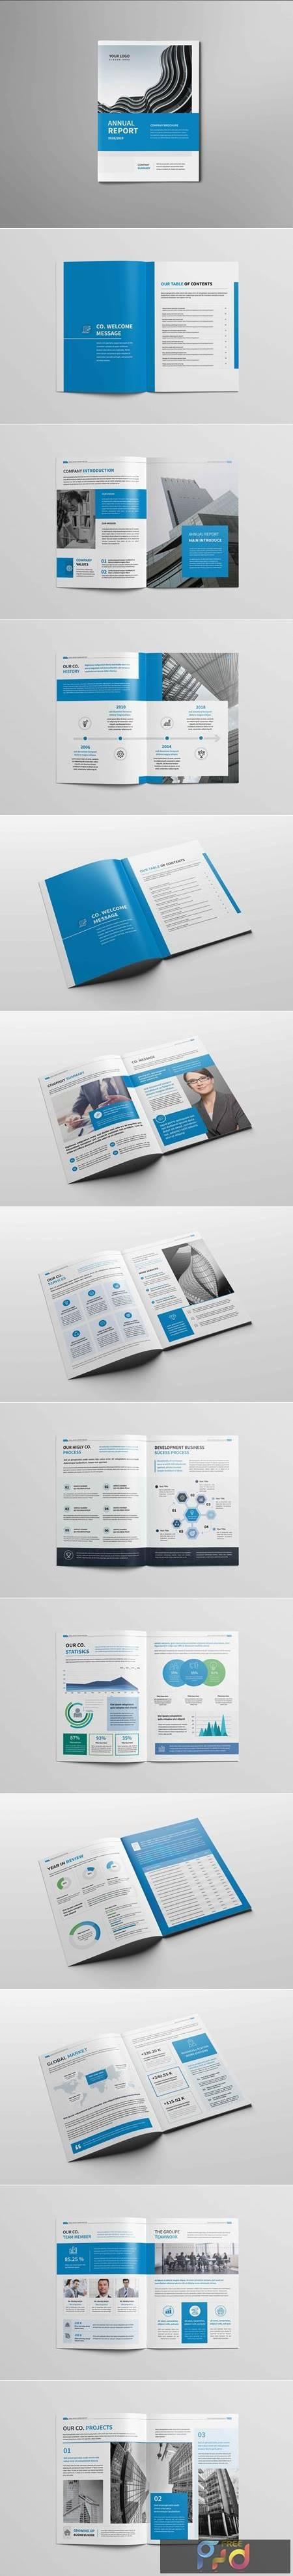 Annual Report Brochure 5012768 1